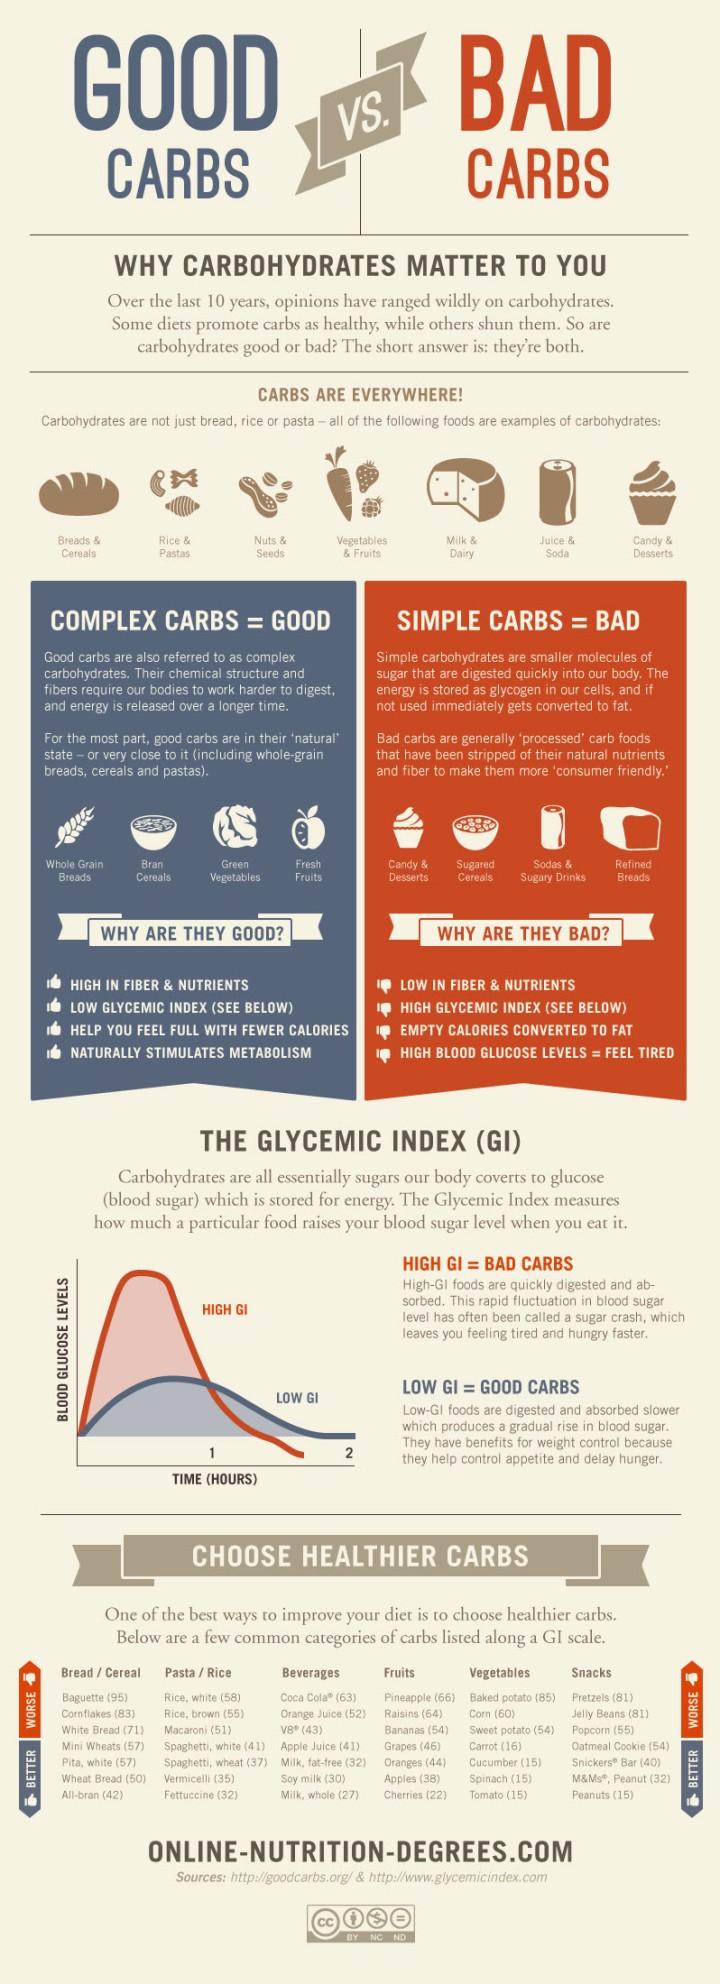 good_carbs_vs_bad_carbs_infographic